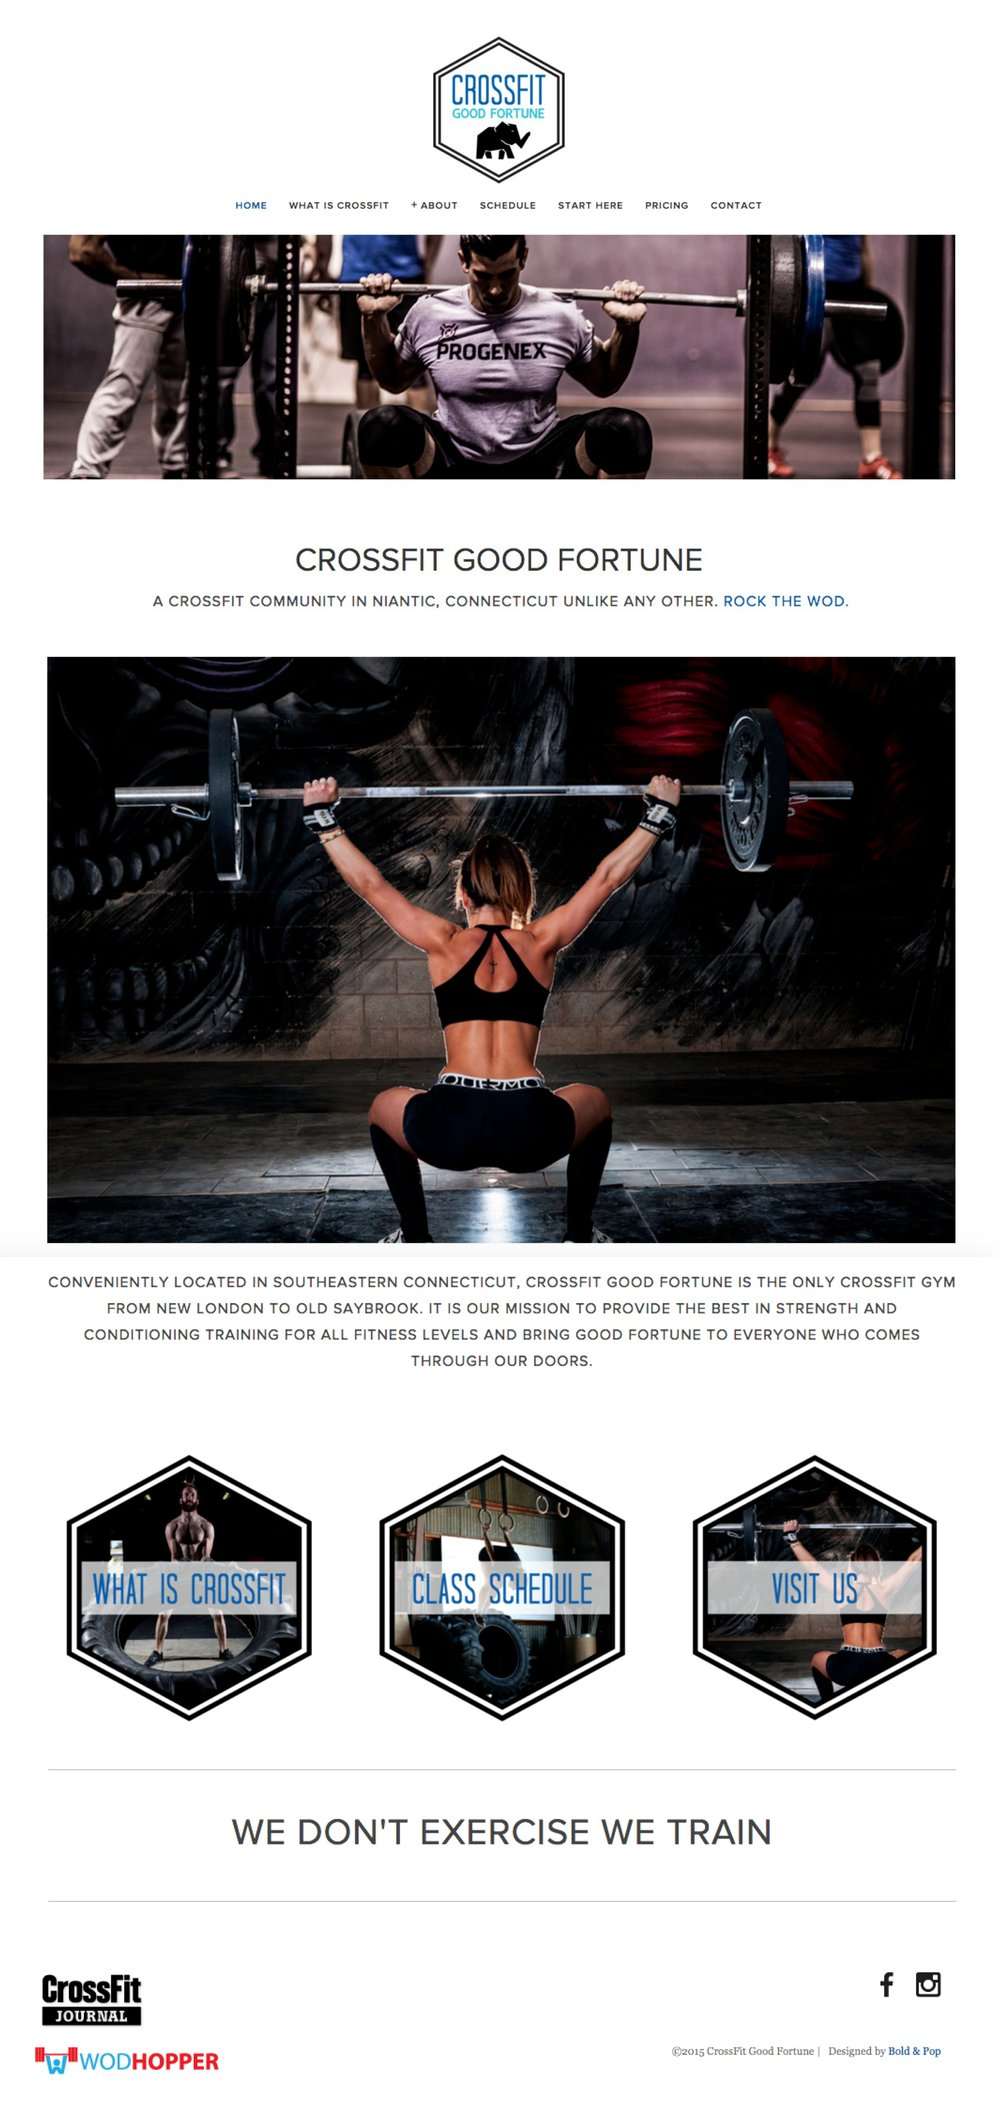 Crossfit Gym Branding & Website  Design